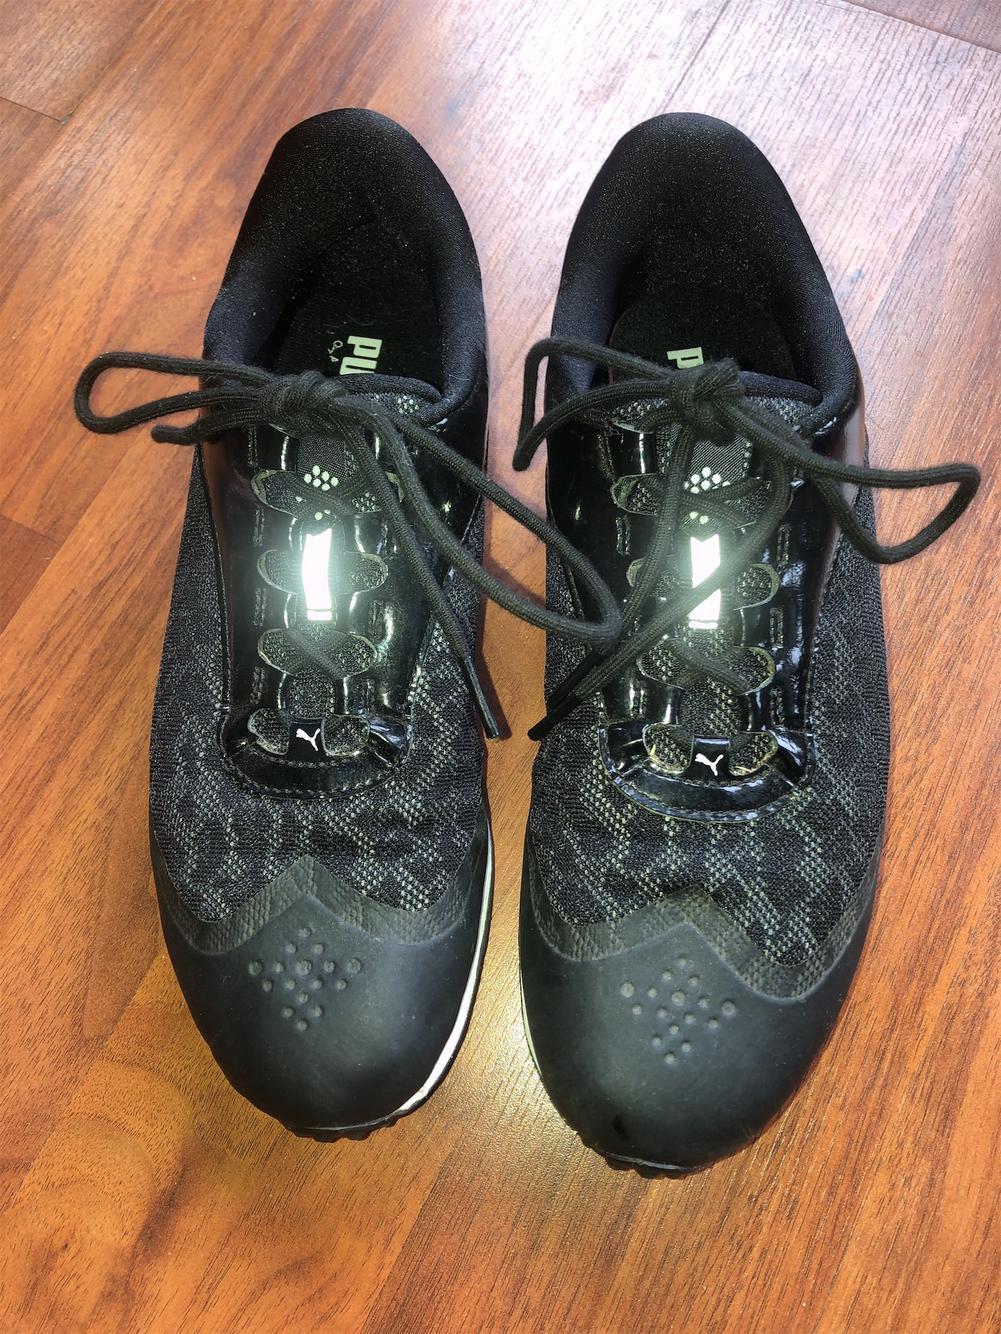 Puma SummerCat Sport Womens Shoe (size